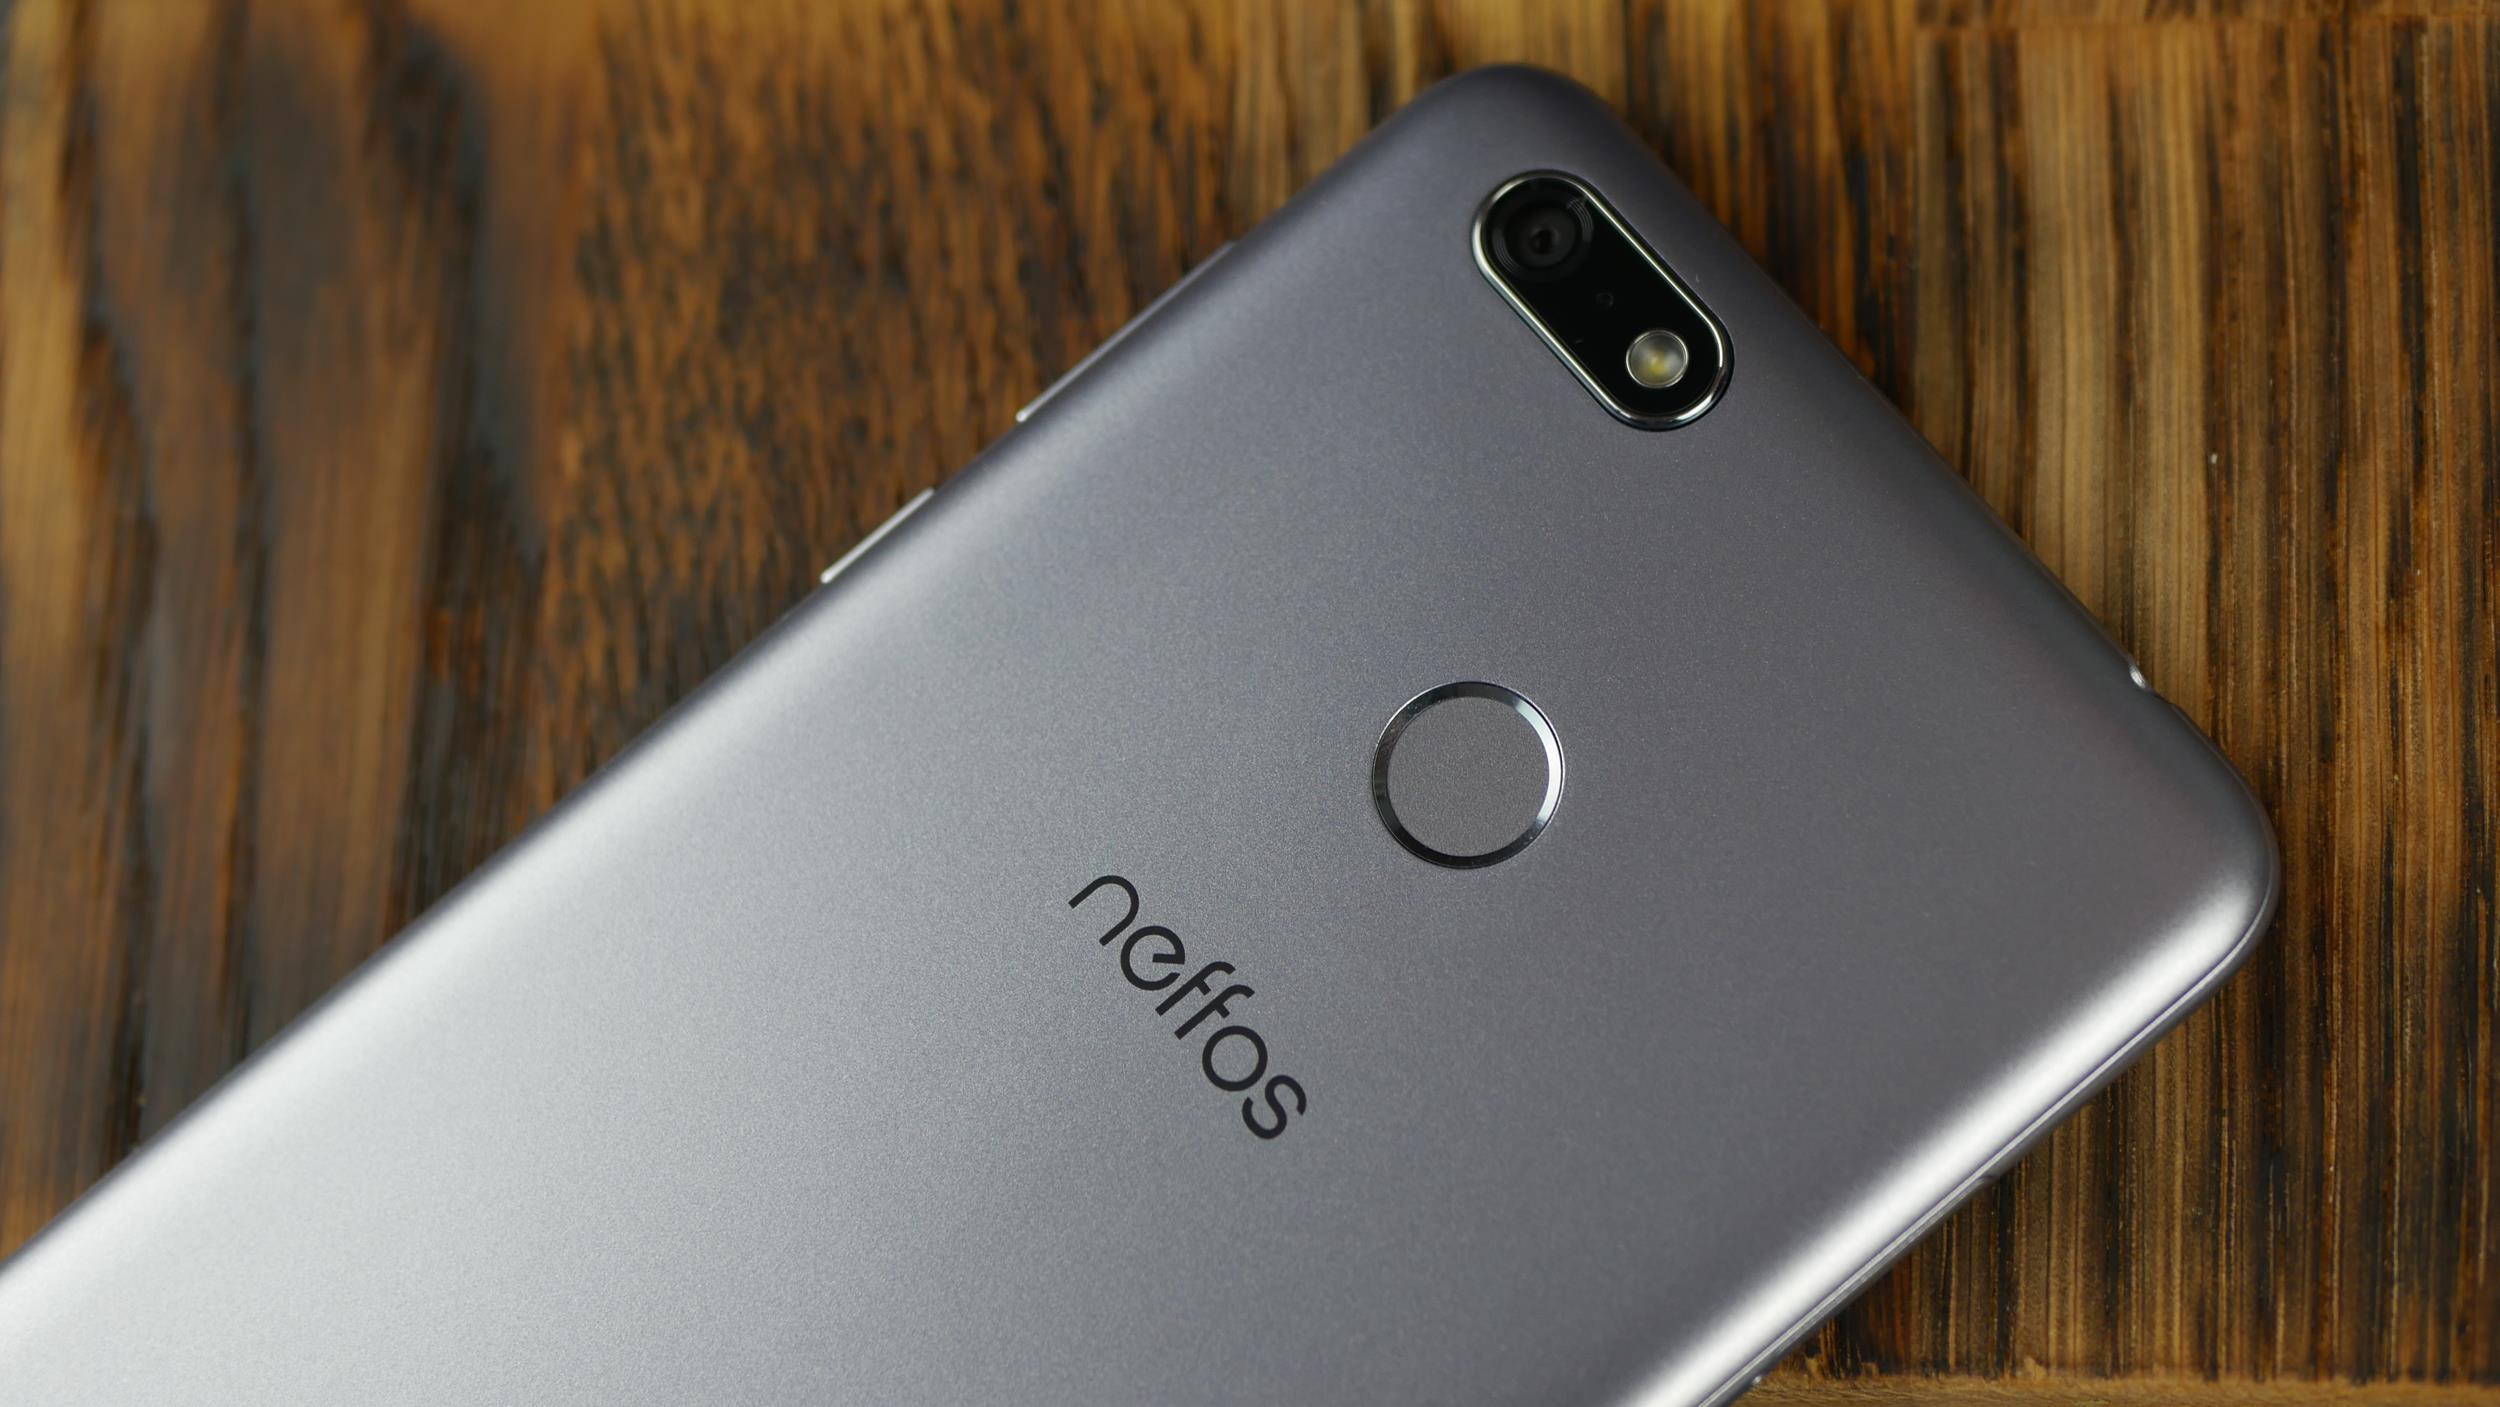 Jaki smartfon warto kupić na Komunię? 19